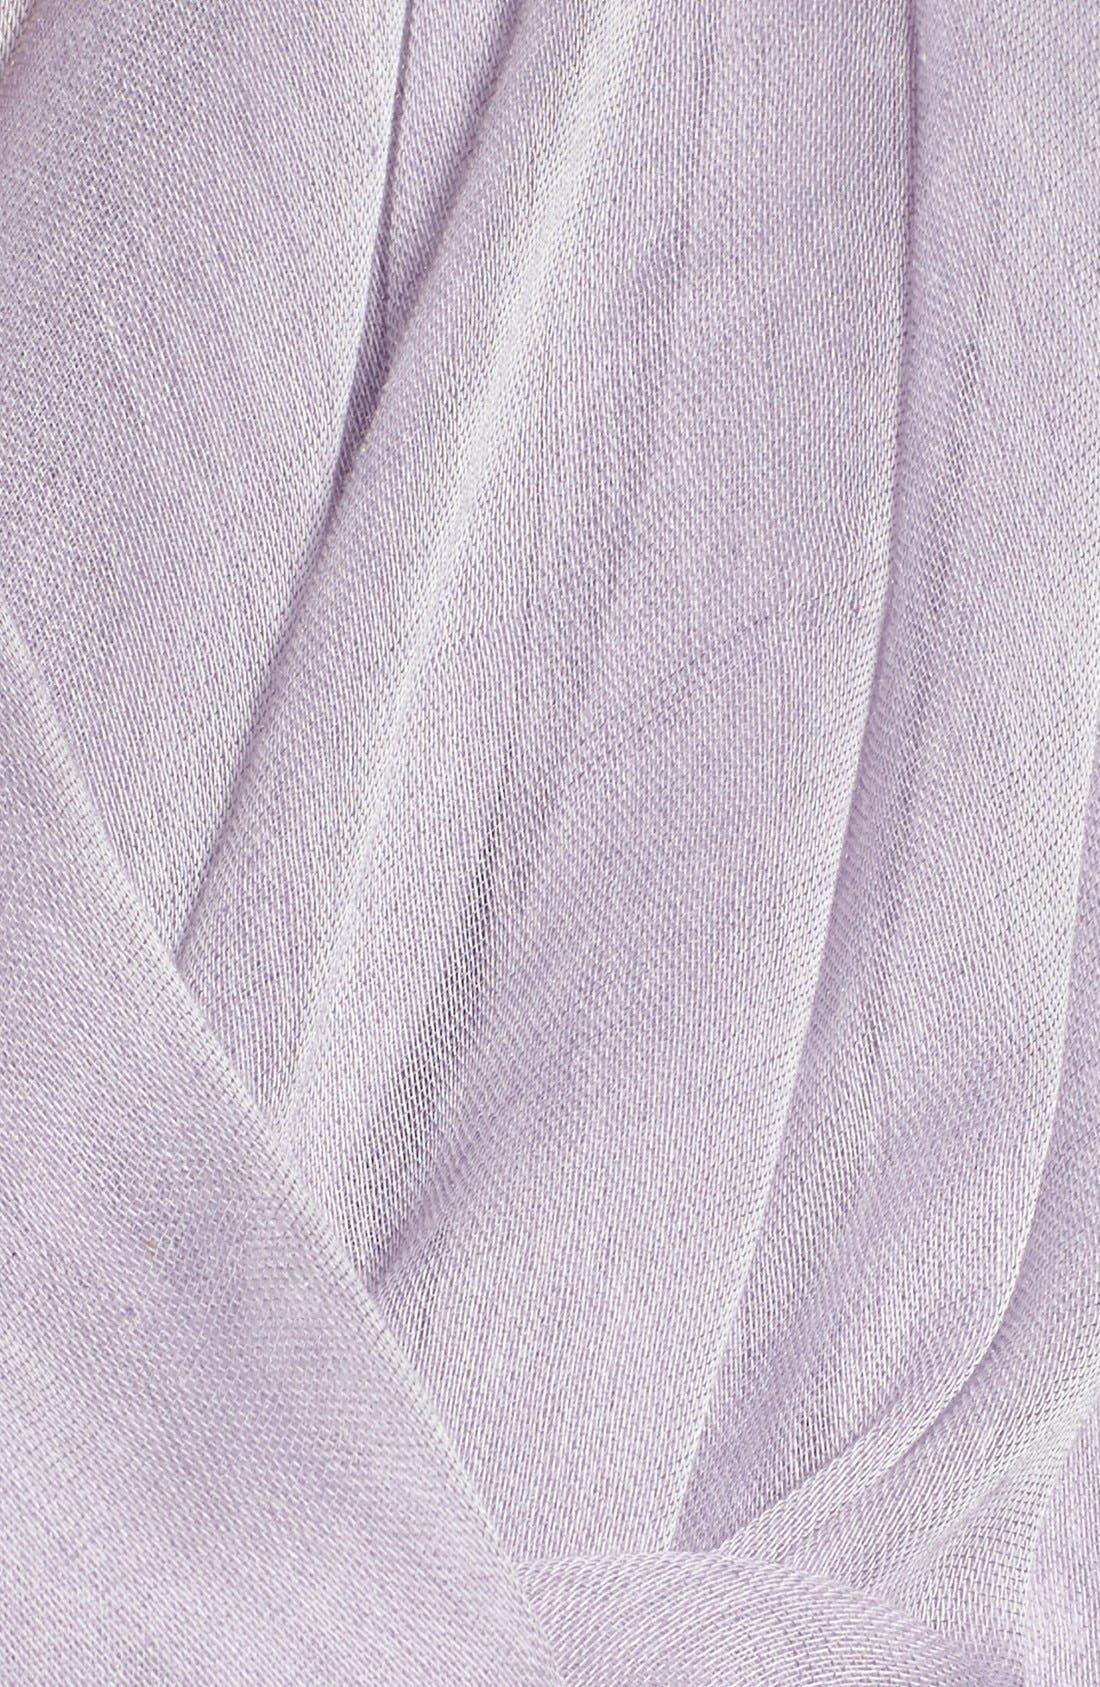 Modal Silk Blend Scarf,                             Alternate thumbnail 63, color,